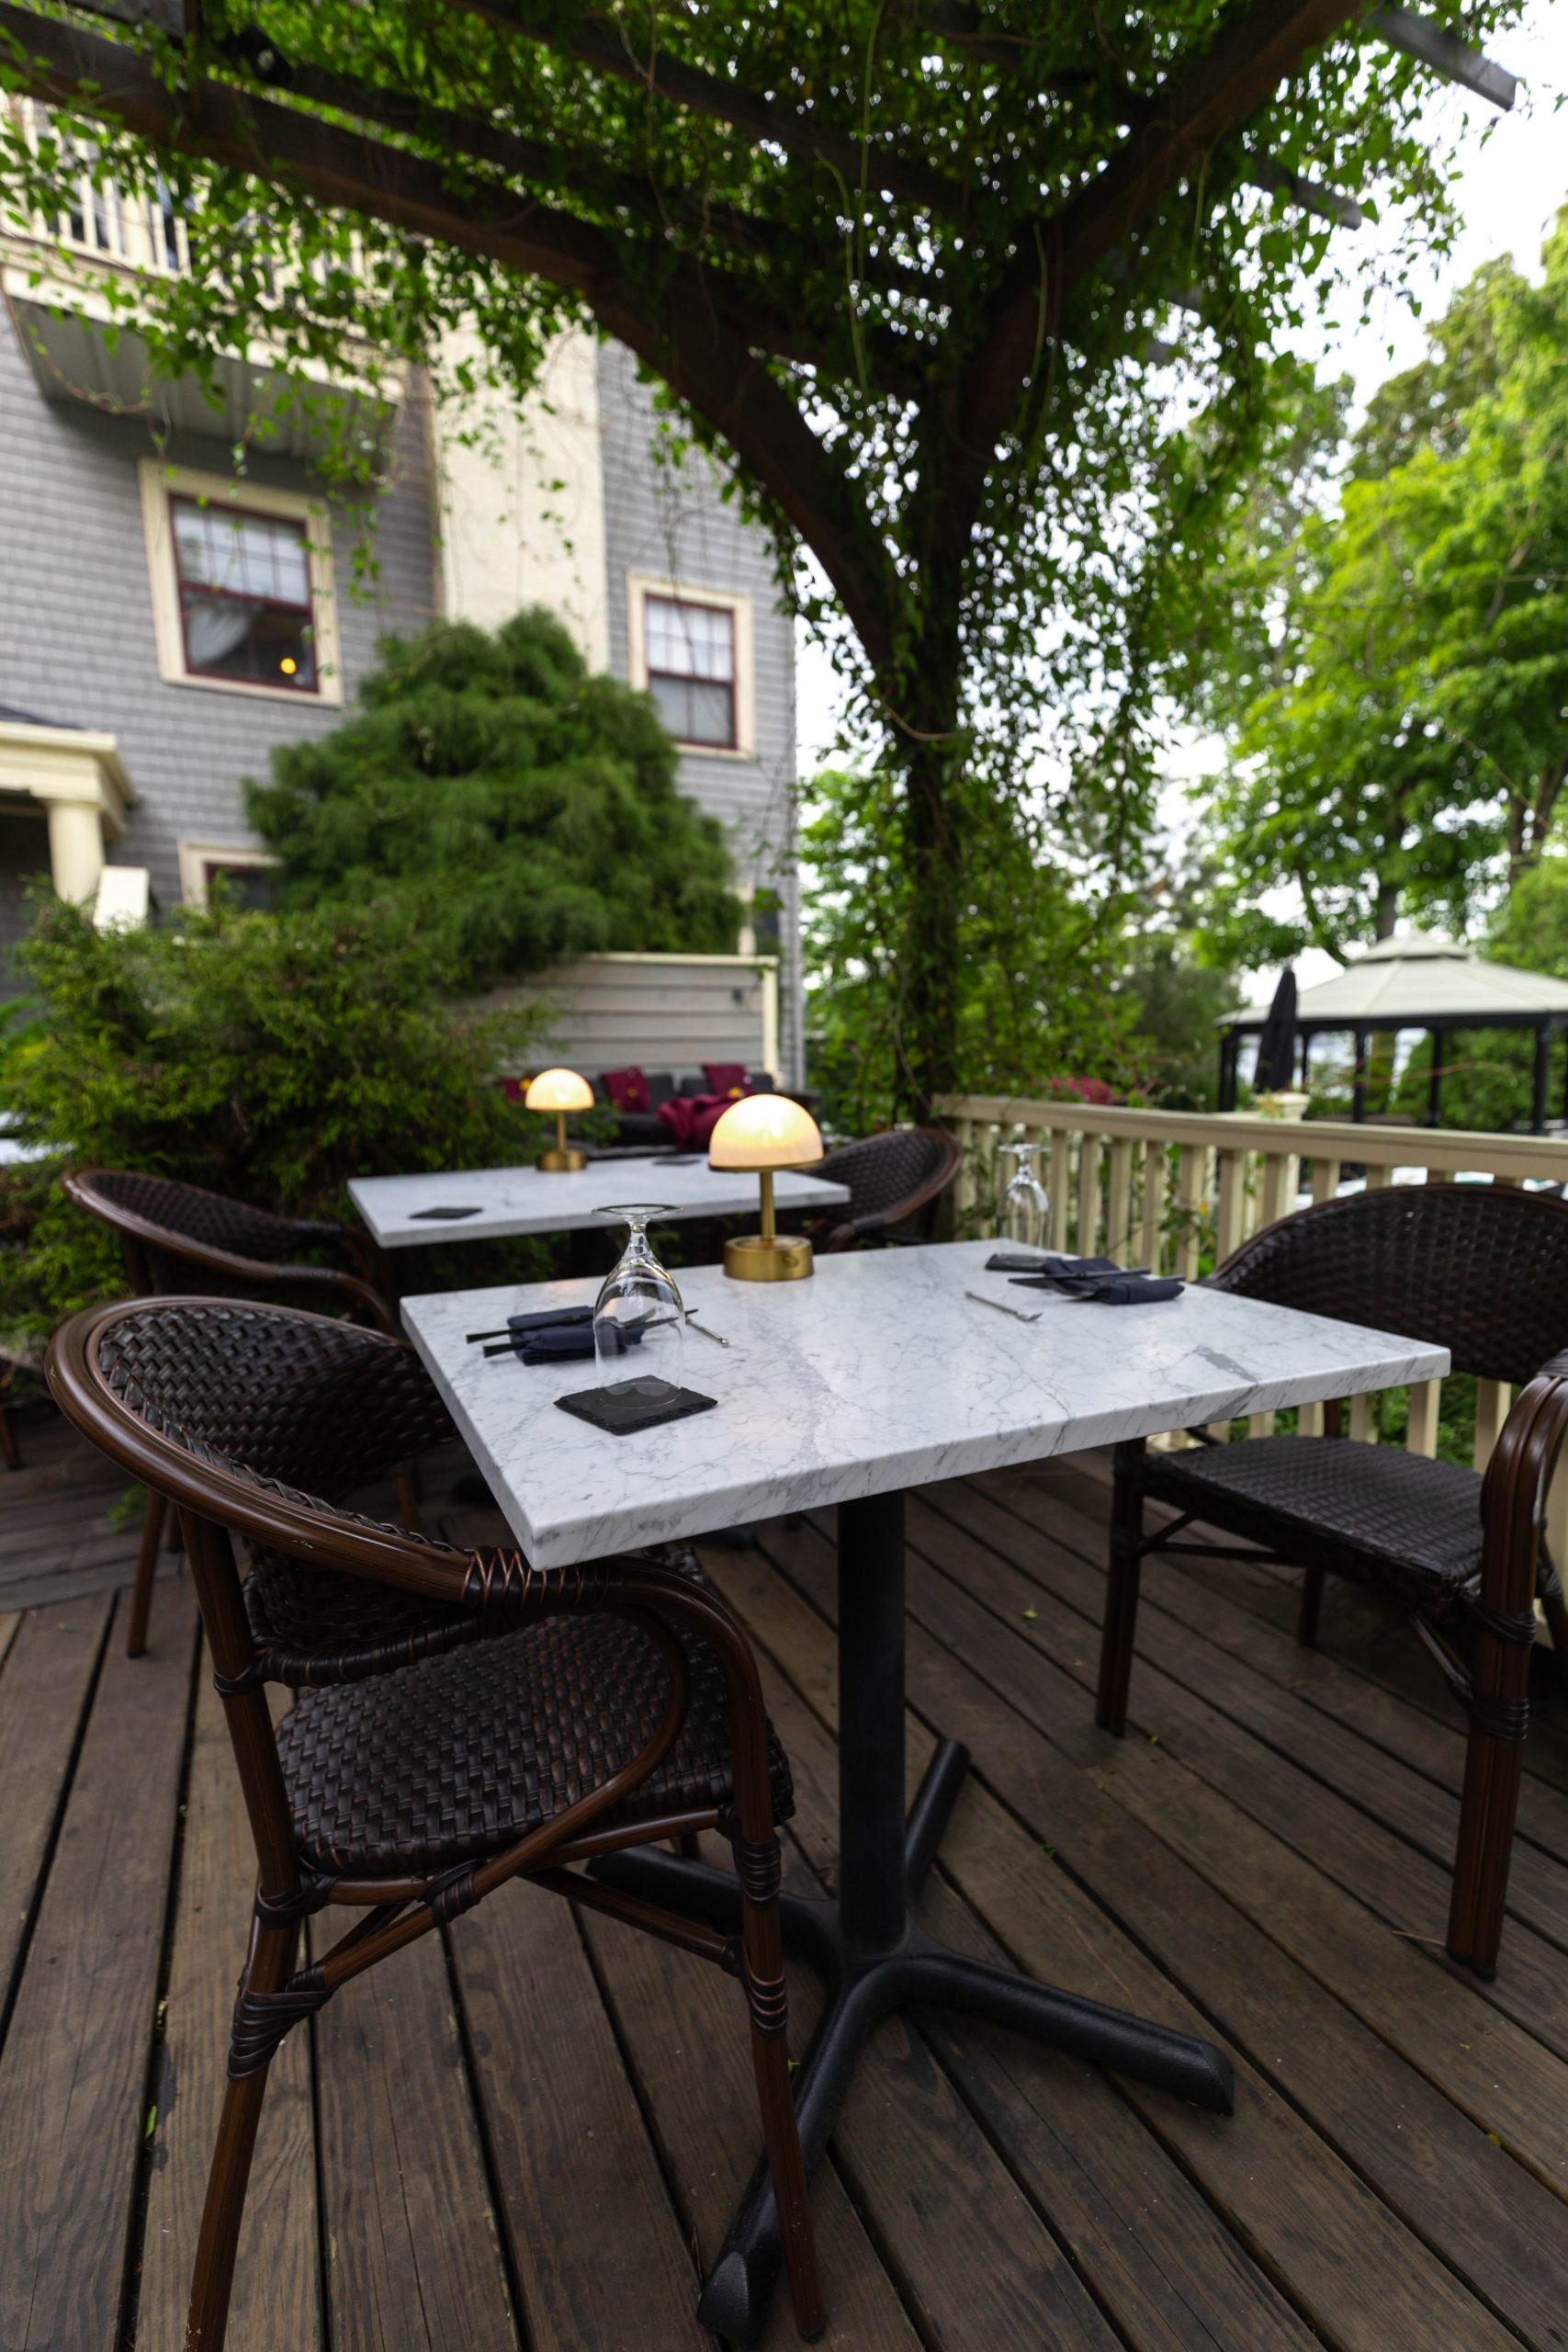 The Veranda Restaurant Inside Balance Rock Inn in Bar Harbor, Maine Photographed and Written by Luxury Travel Writer Annie Fairfax